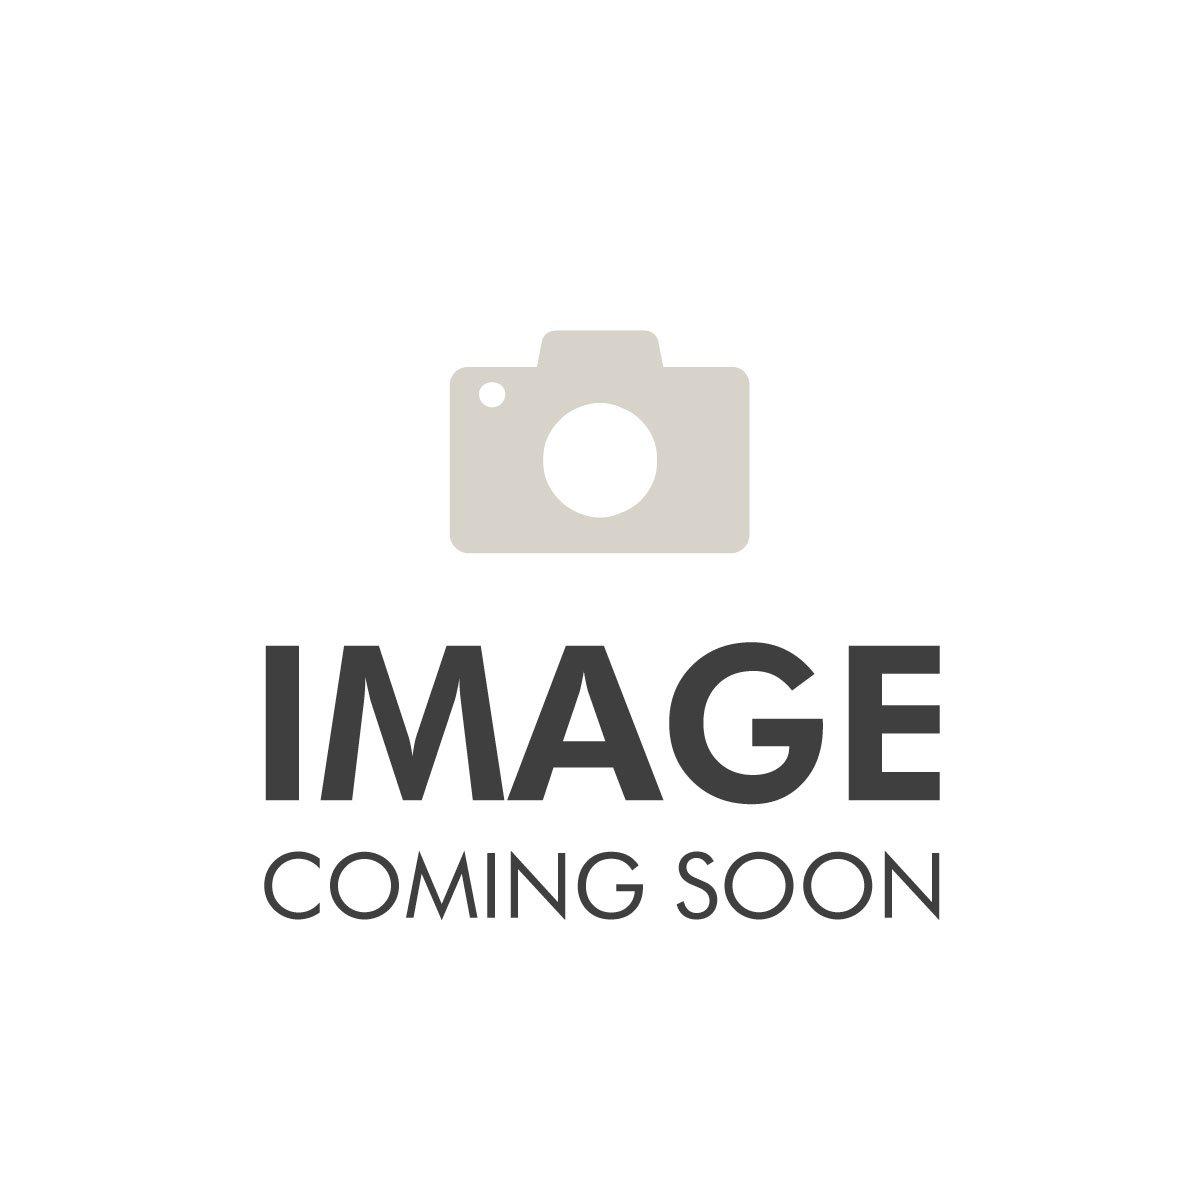 Clarins 100ml Body Treatment Oil - Relax